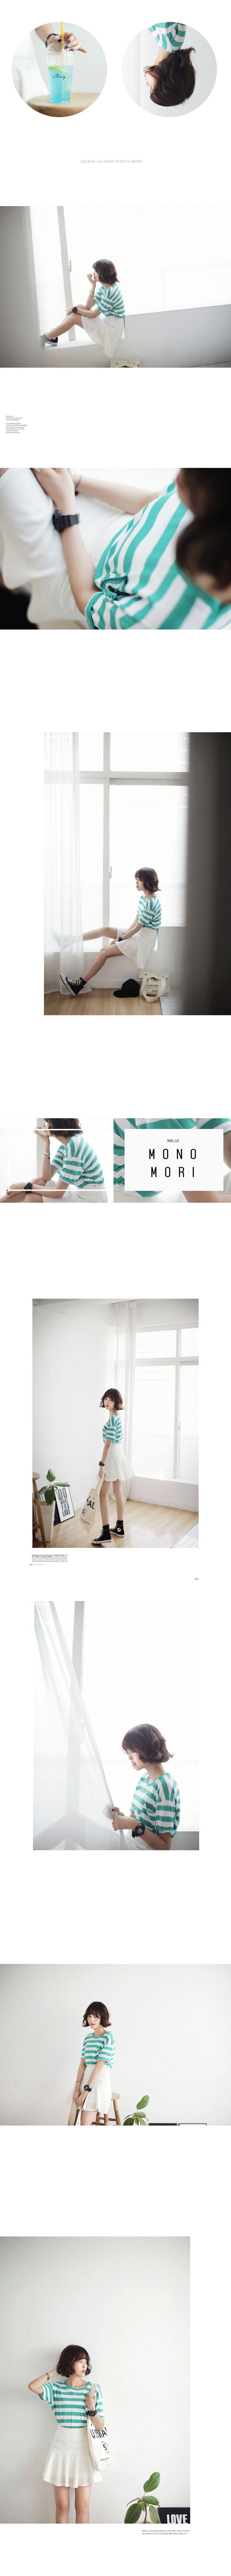 *MONOMORI-モノモリ-*切り替えフレアミニスカート・全2色スカートスカート|レディースファッション通販 DHOLICディーホリック [ファストファッション 水着 ワンピース]